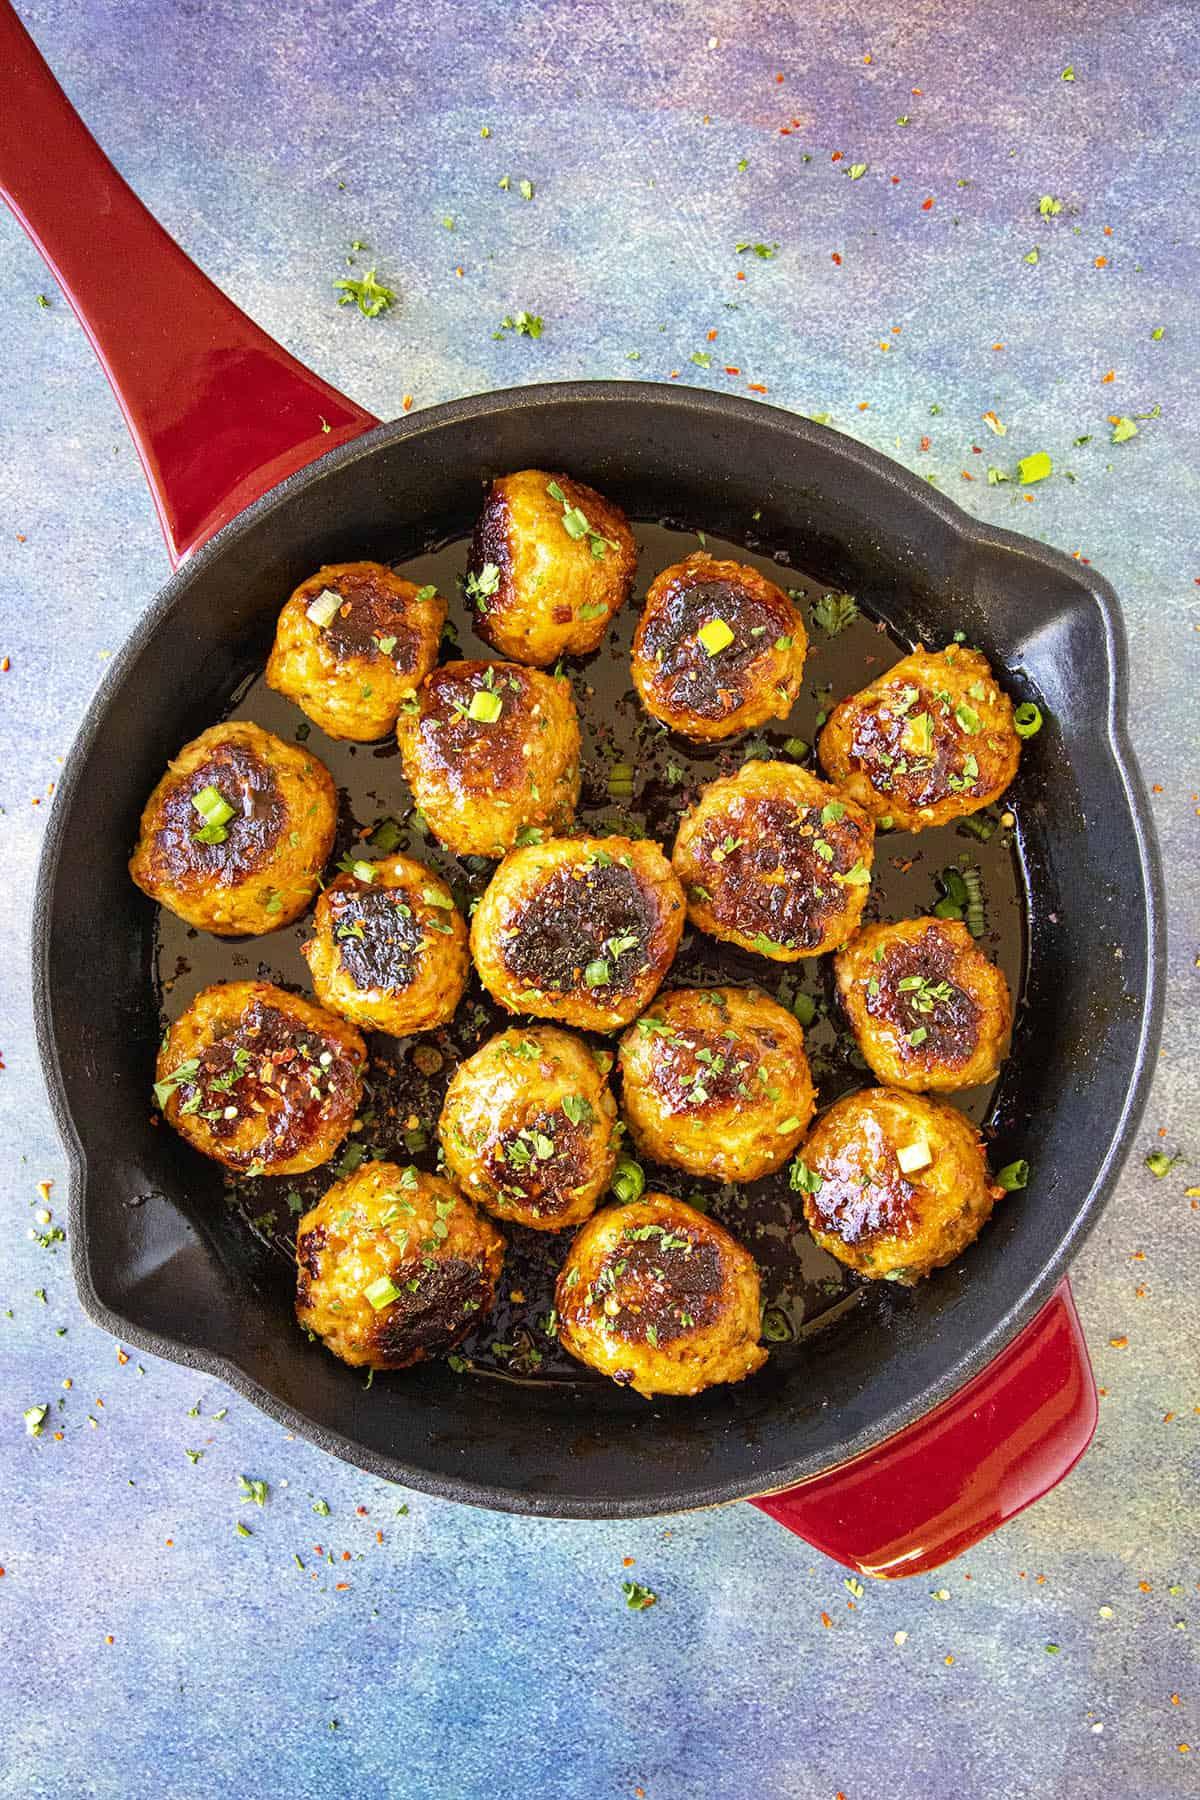 Spicy Korean Chicken Meatballs in a pan, glistening with sticky gochujang glaze